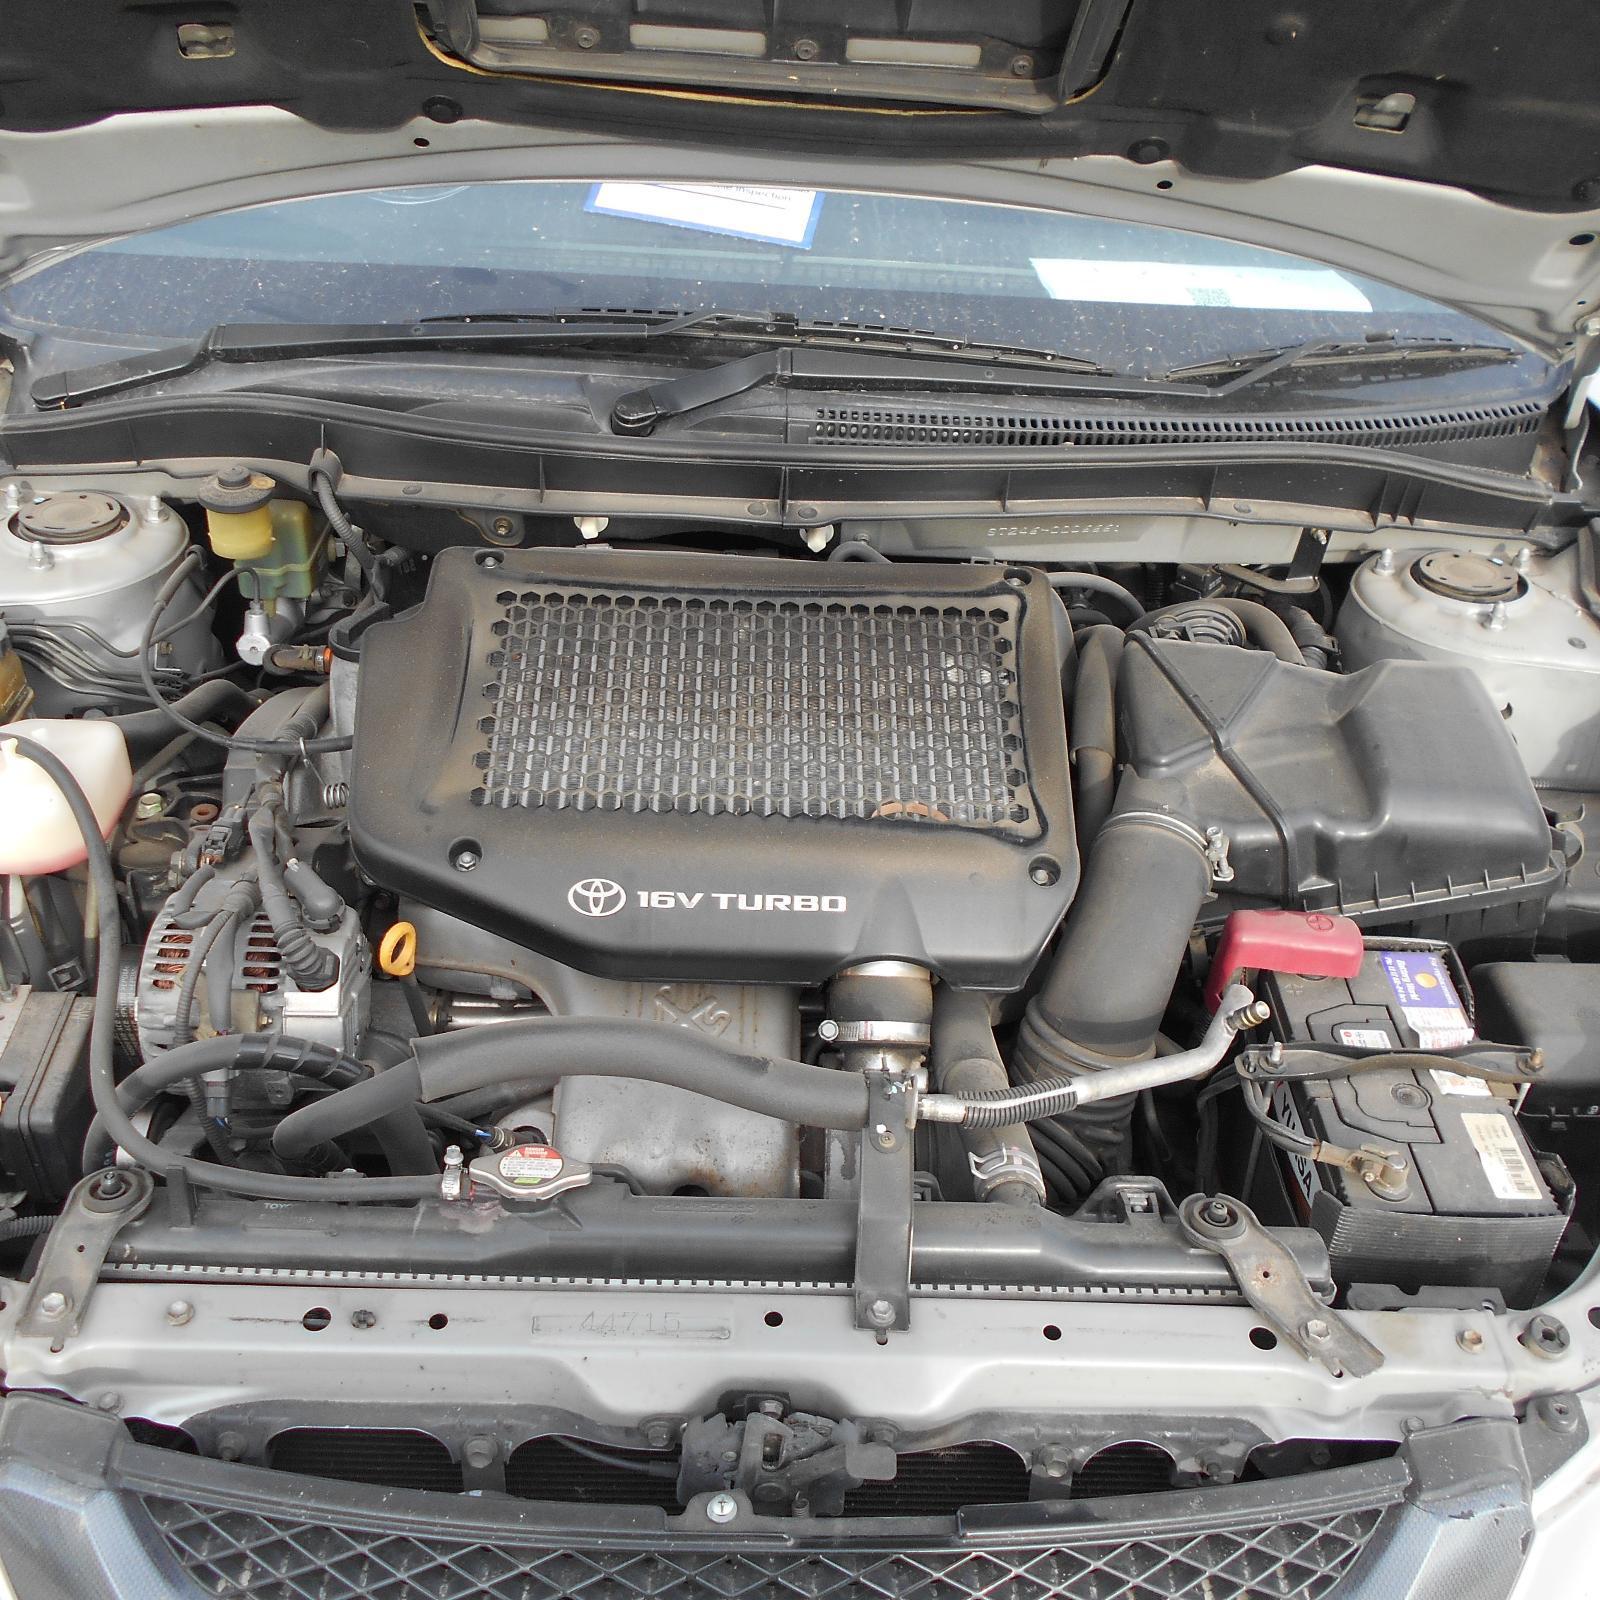 TOYOTA CALDINA, Engine, 2.0, 3S-GTE, TURBO, T240, 09/02-06/07 (IMPORT)